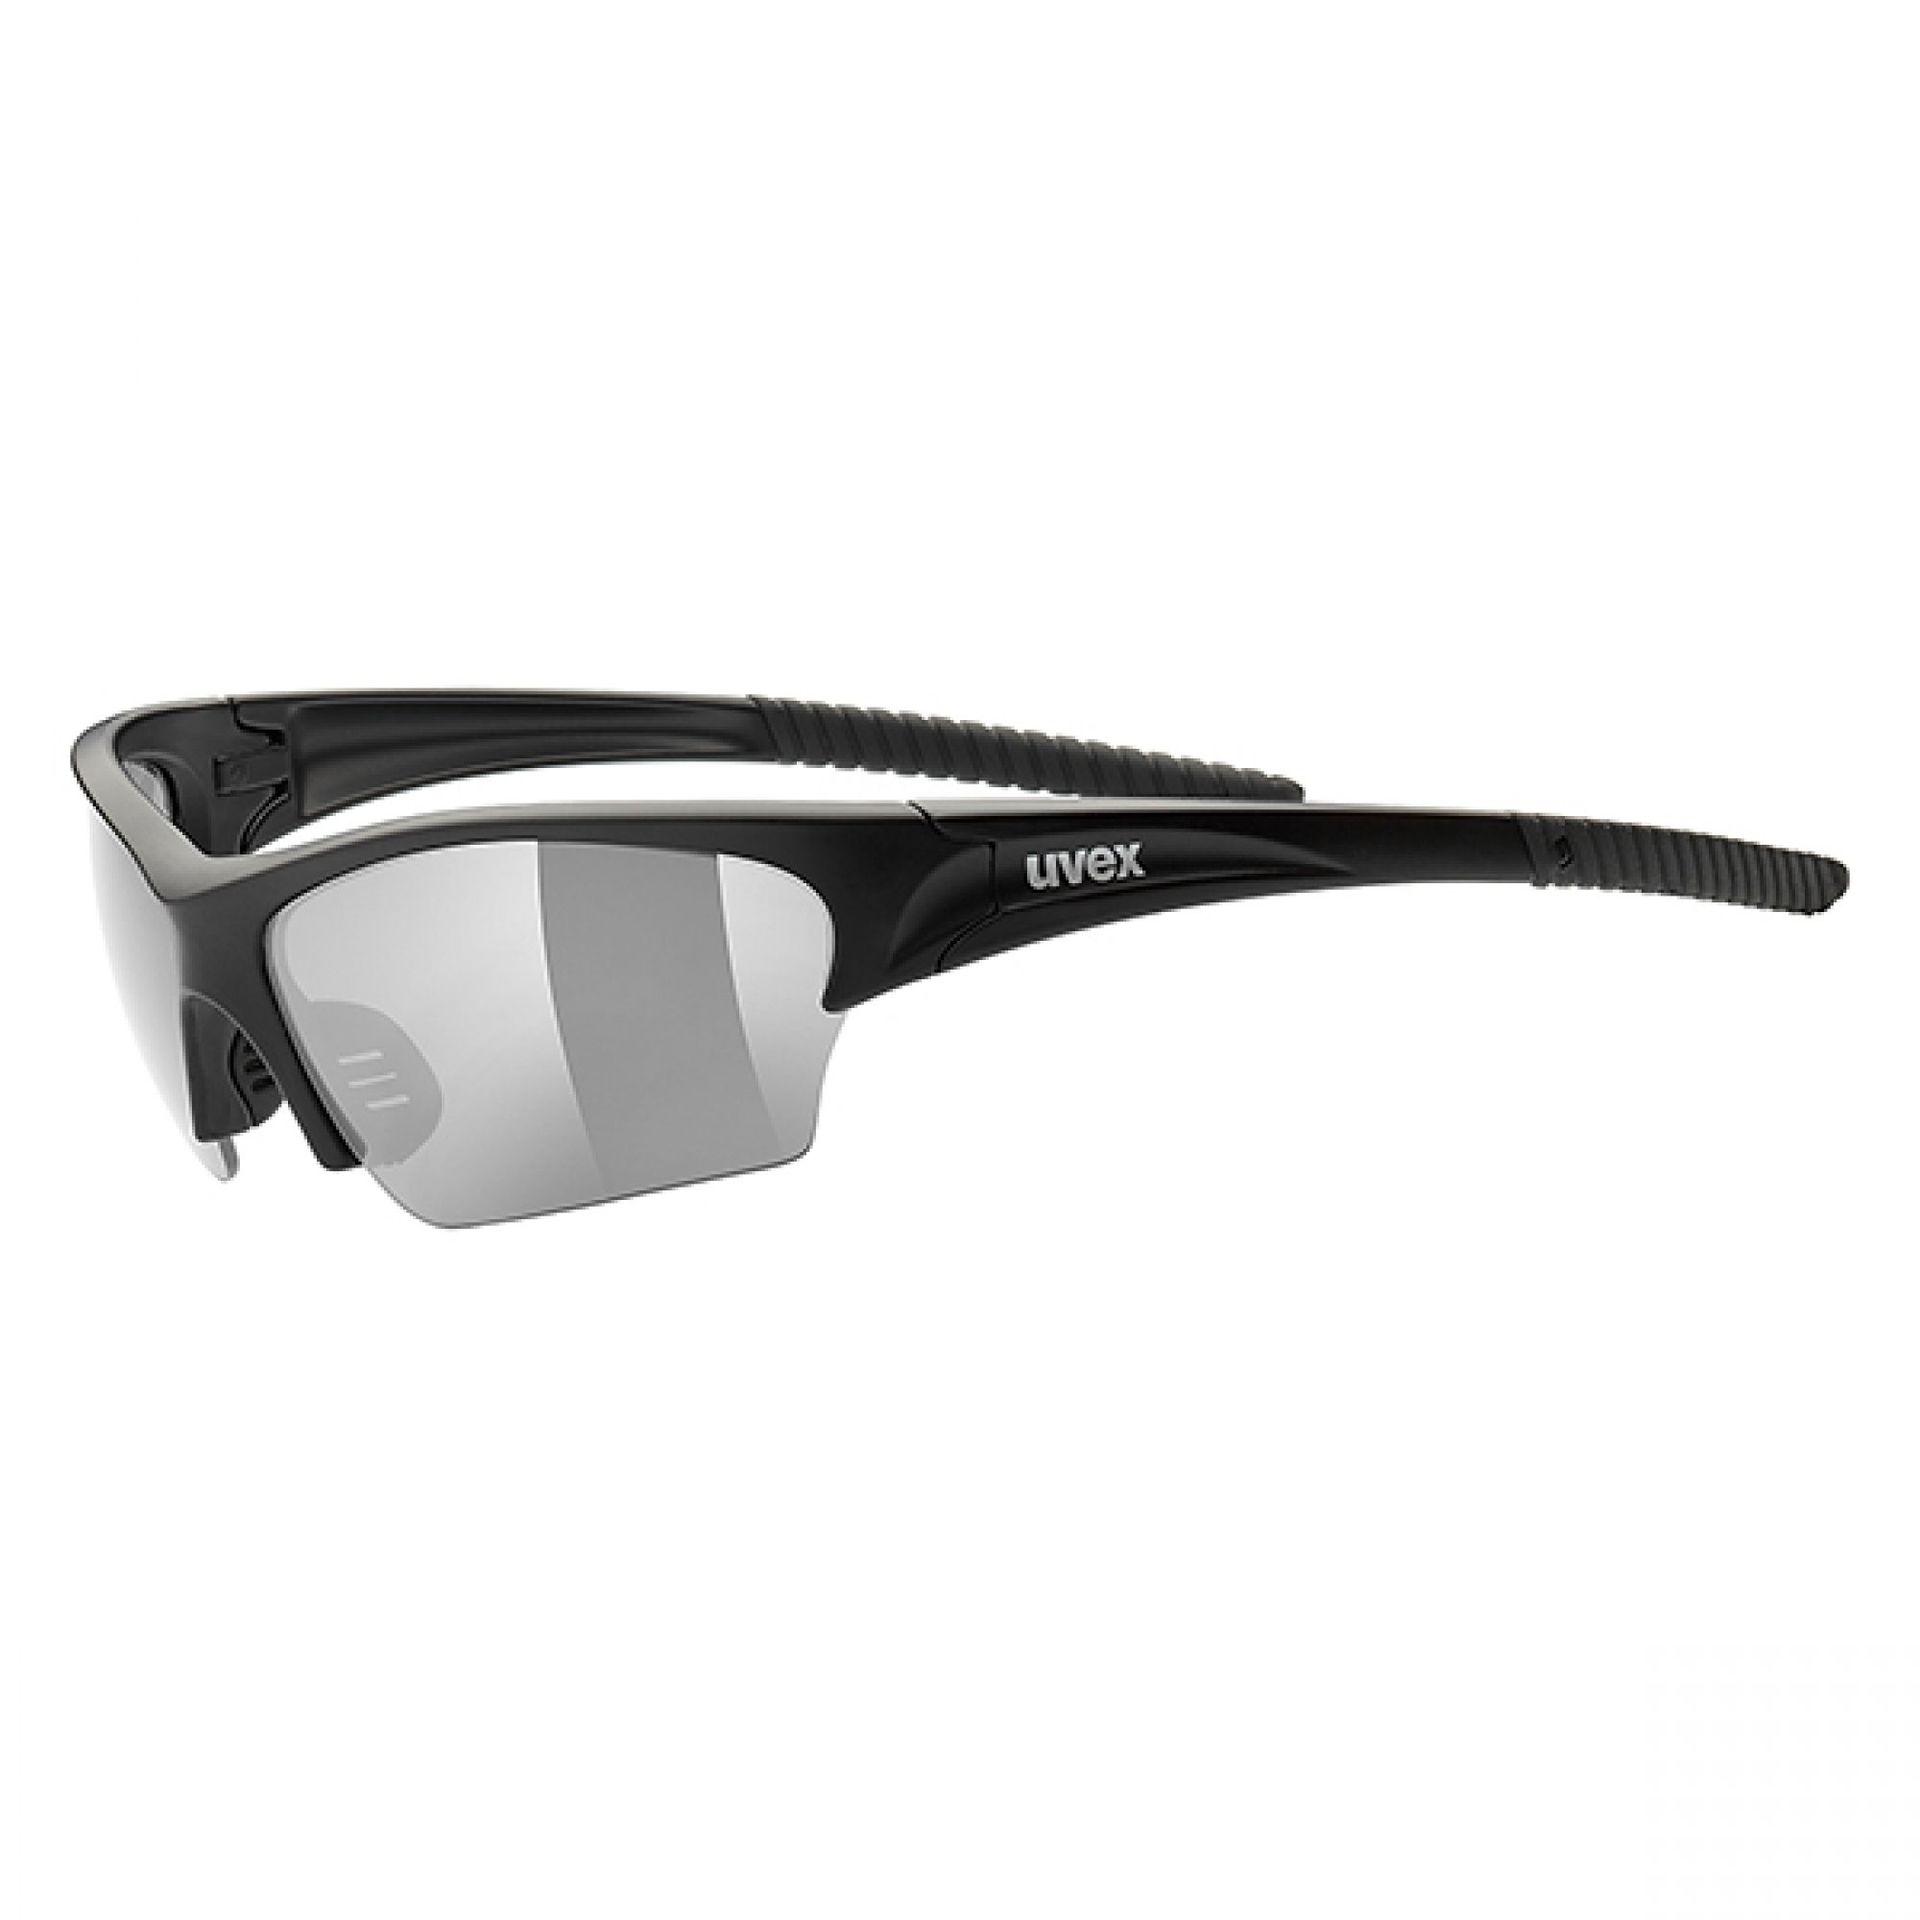 Okulary Uvex Sunsation czarny